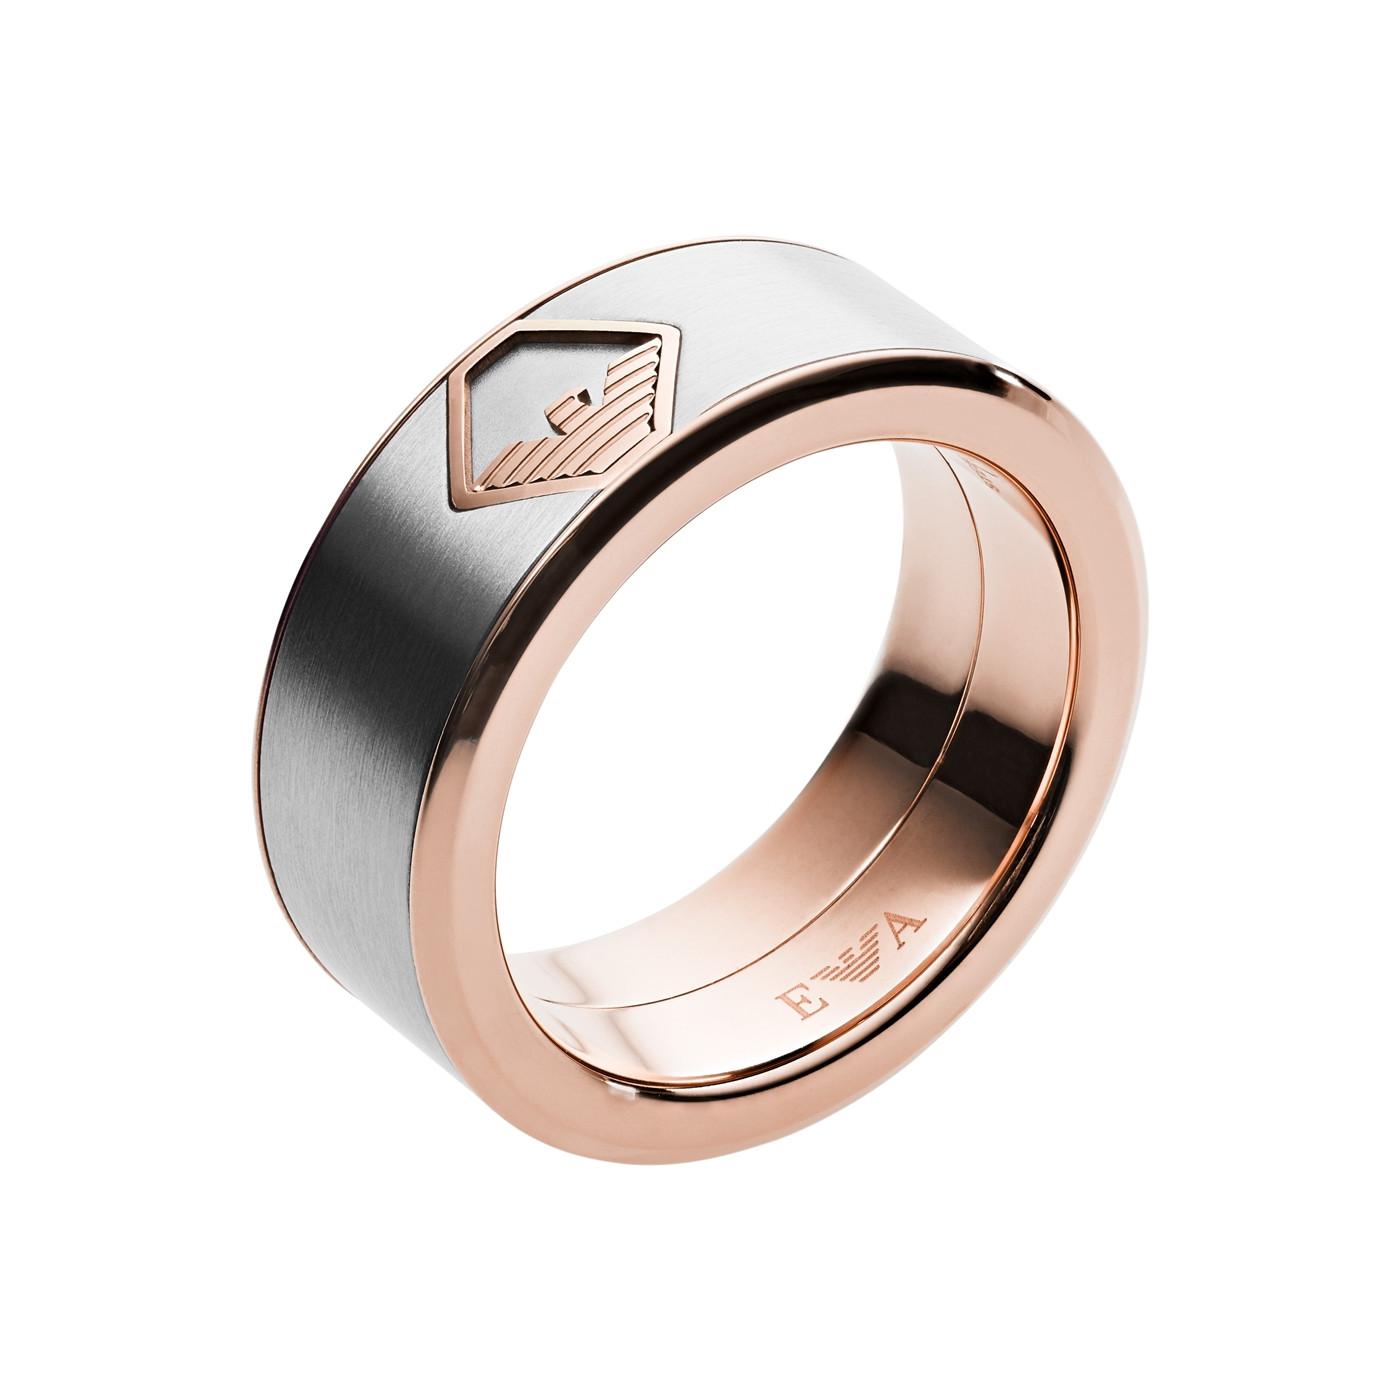 Emporio Armani Heritage Ring EGS2635040